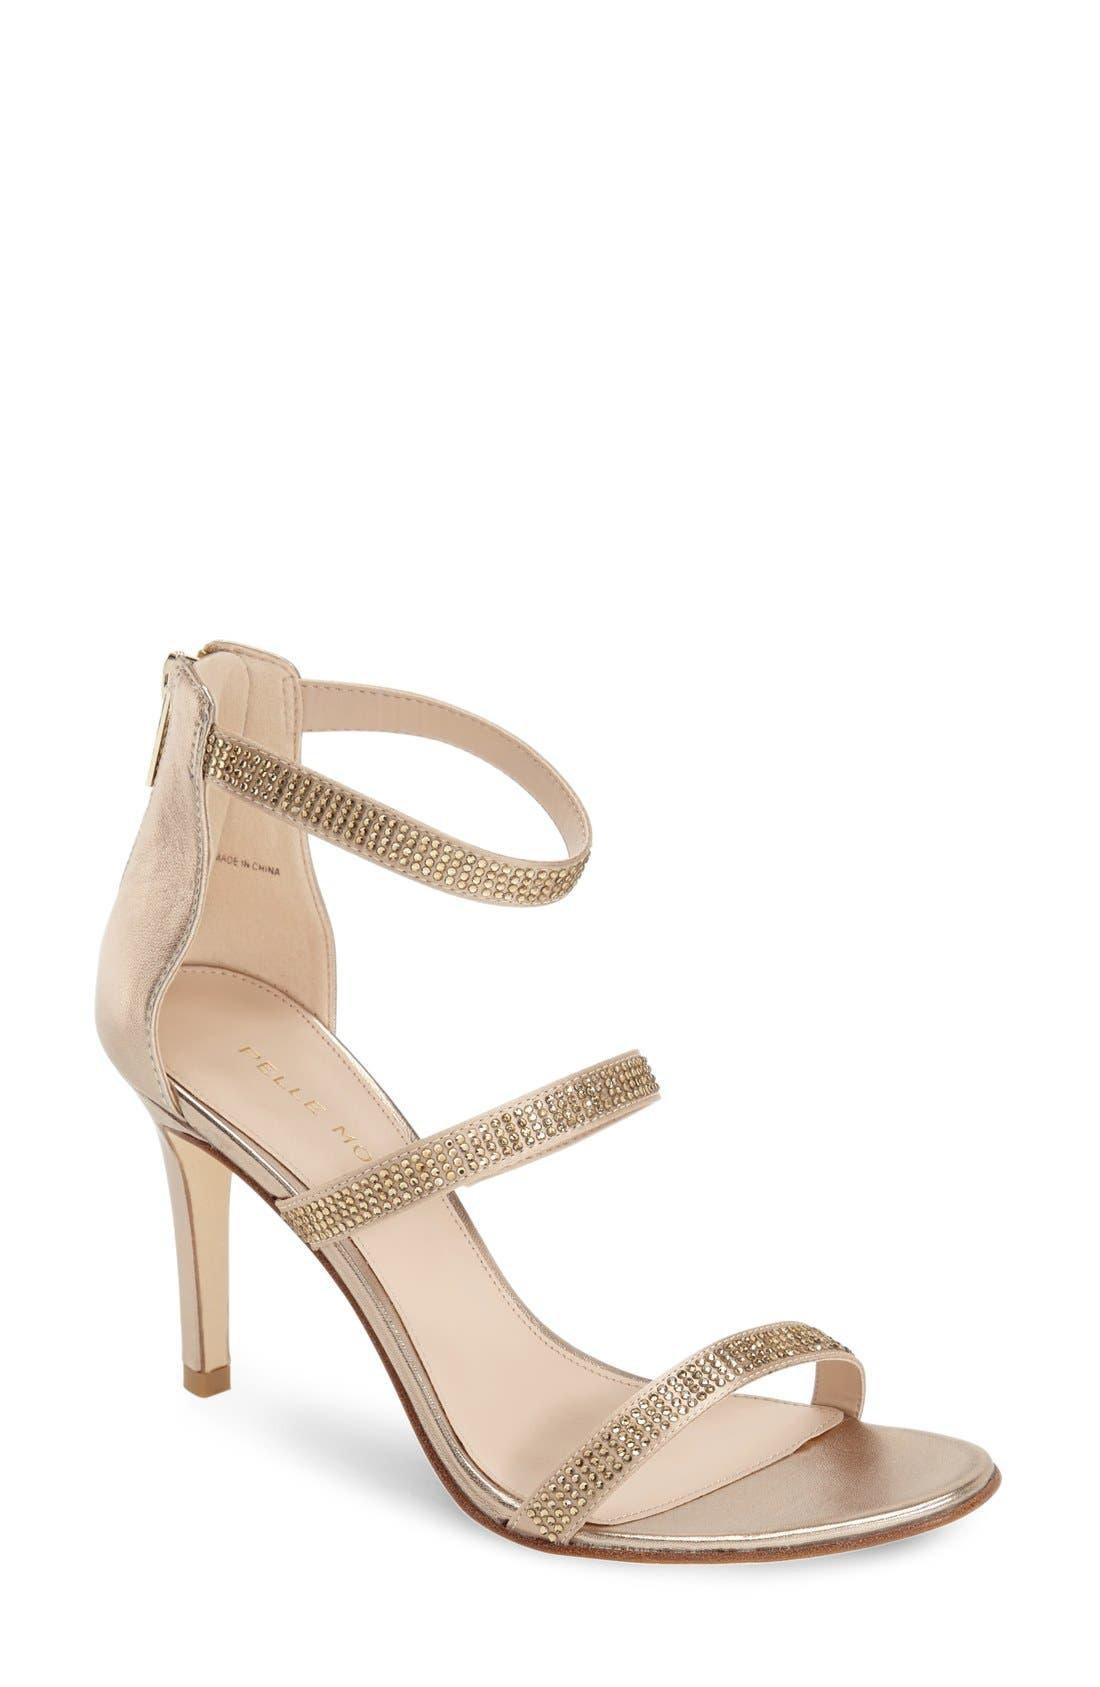 Pelle Moda 'Dalia' Three Strap Sandal (Women)